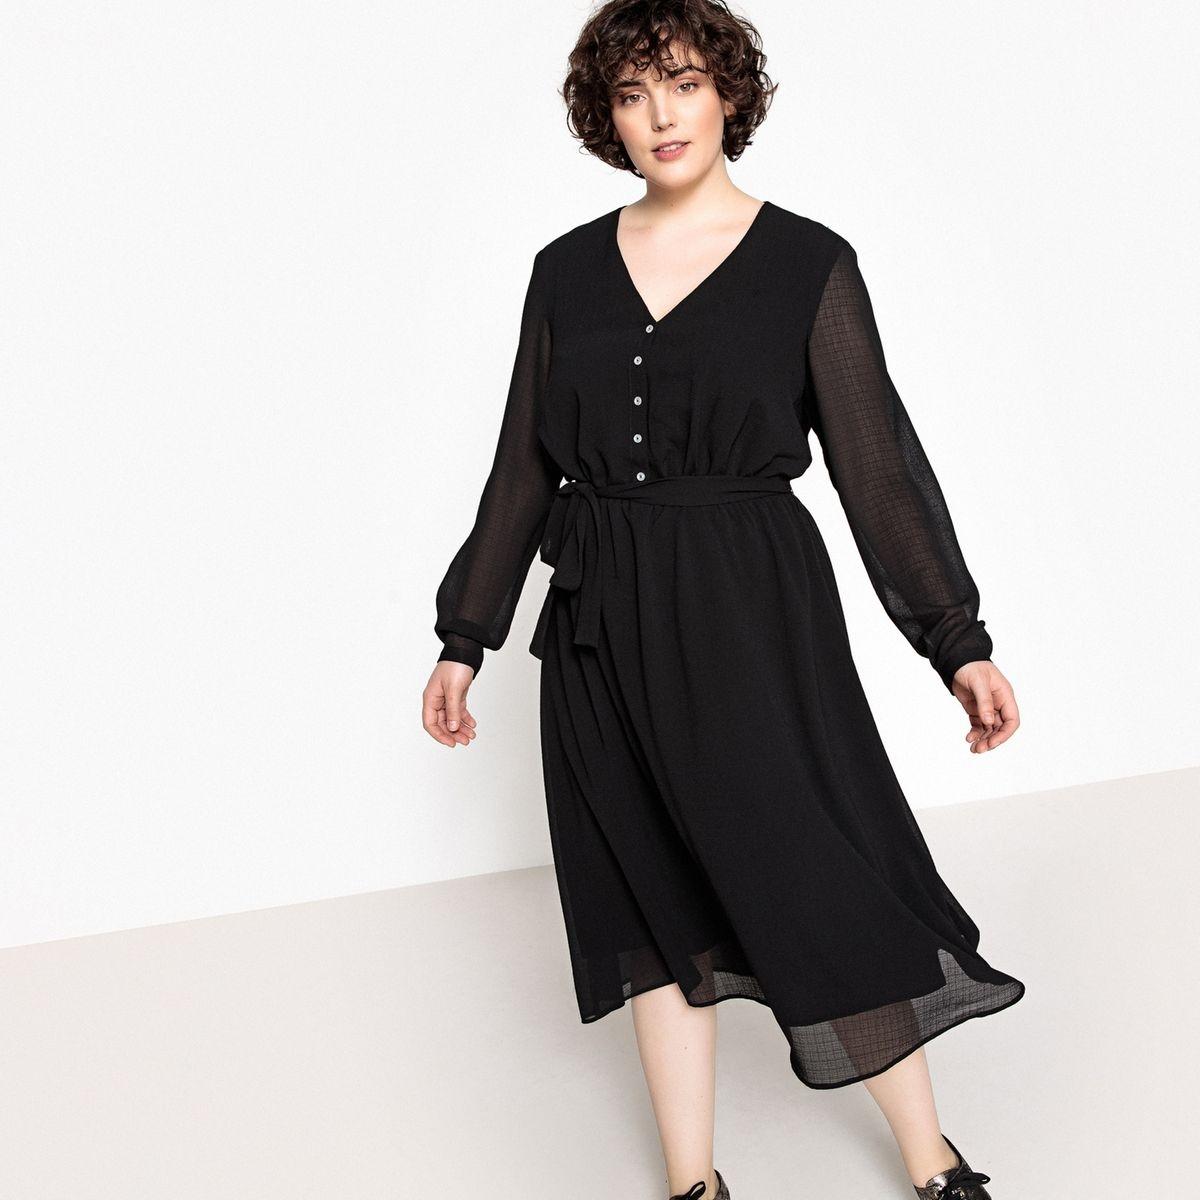 Robe droite, ceinture taille, manches longues